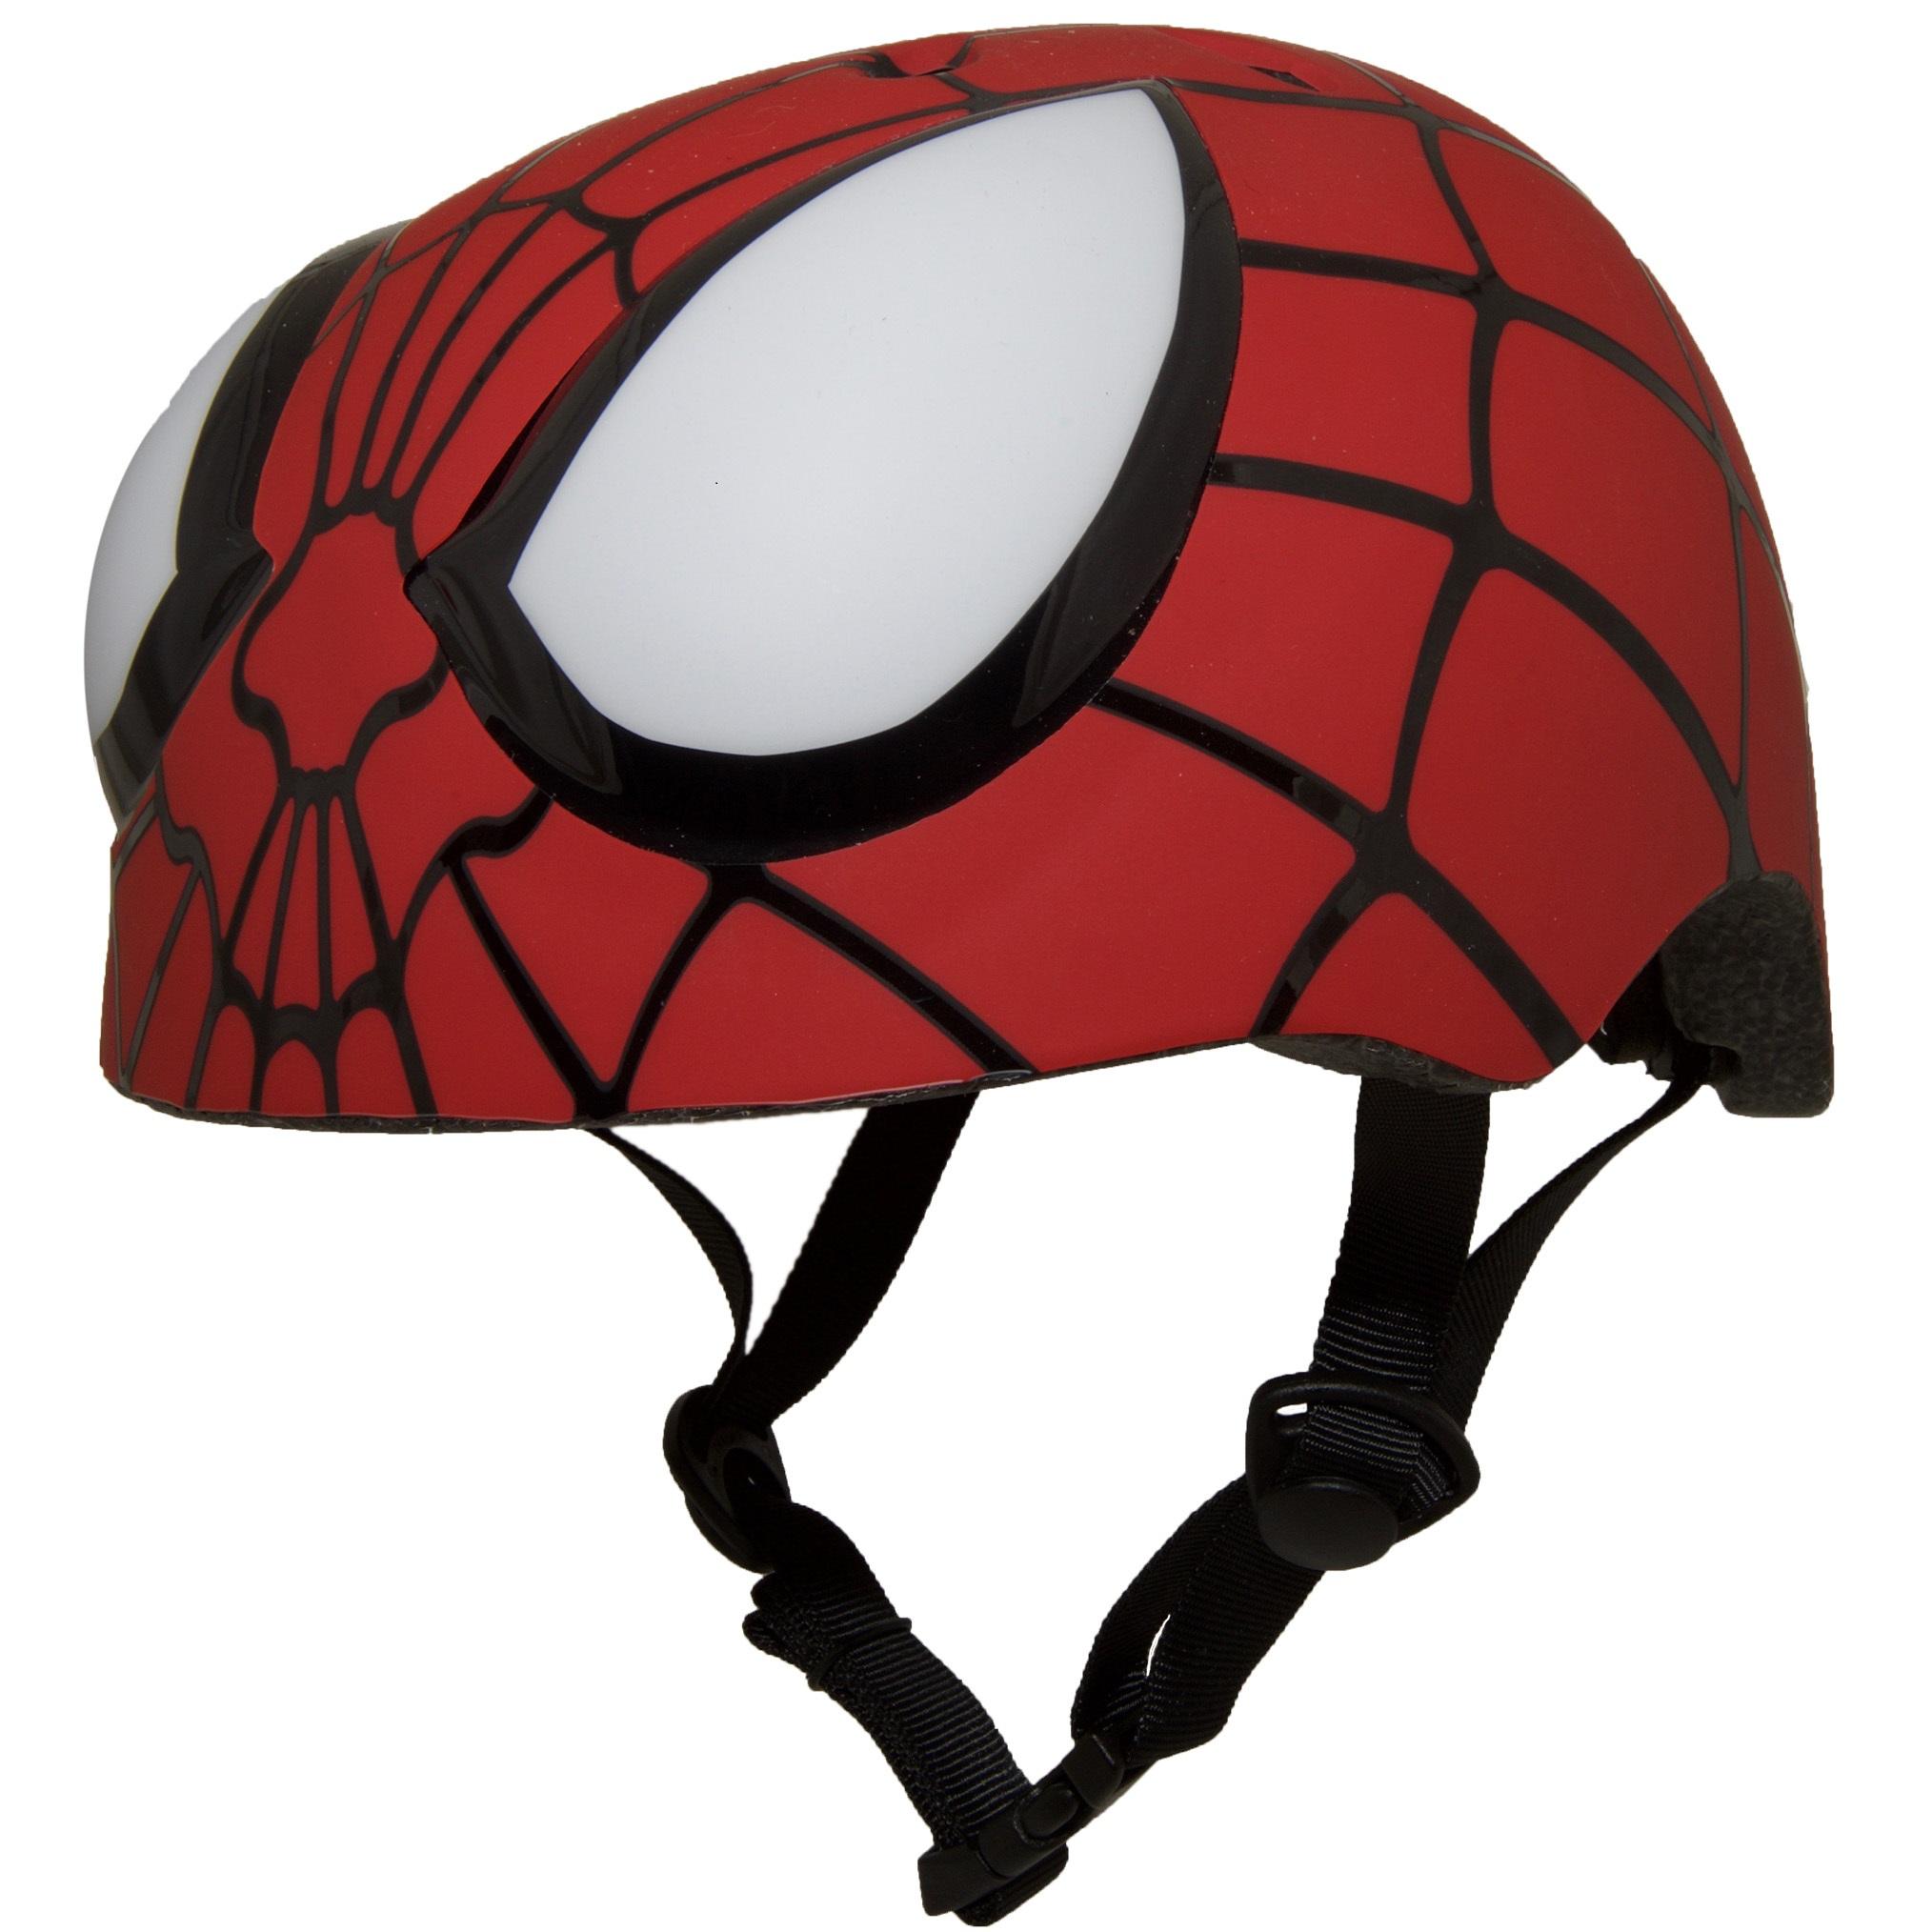 Marvel Spider-Man Bike Helmet, Child